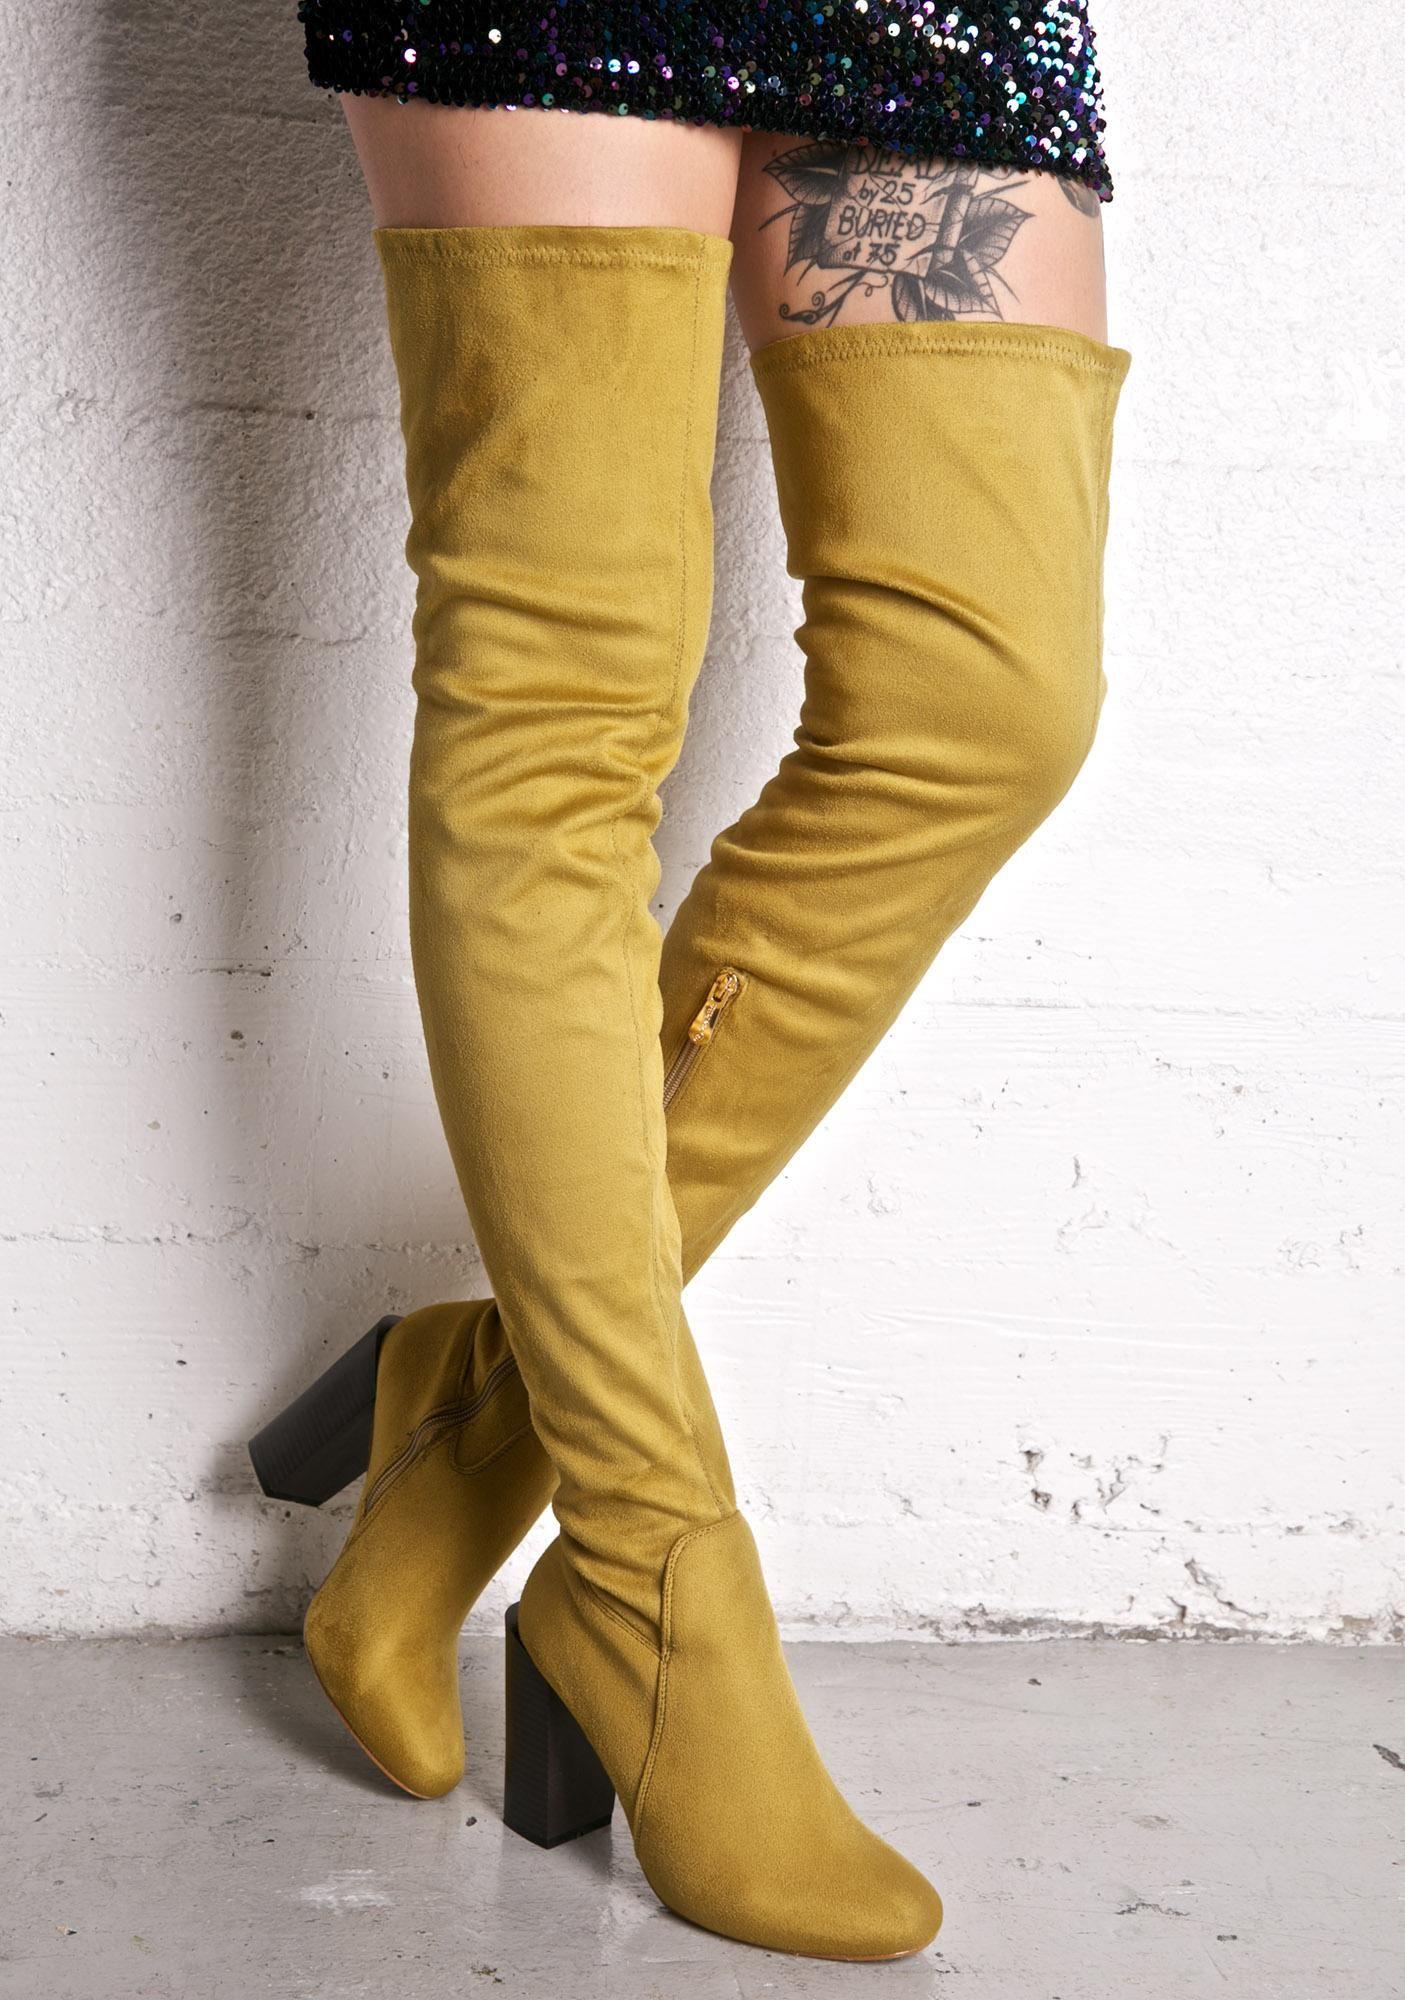 5bf8ac649386 Thigh High Construction Boots - Yu Boots